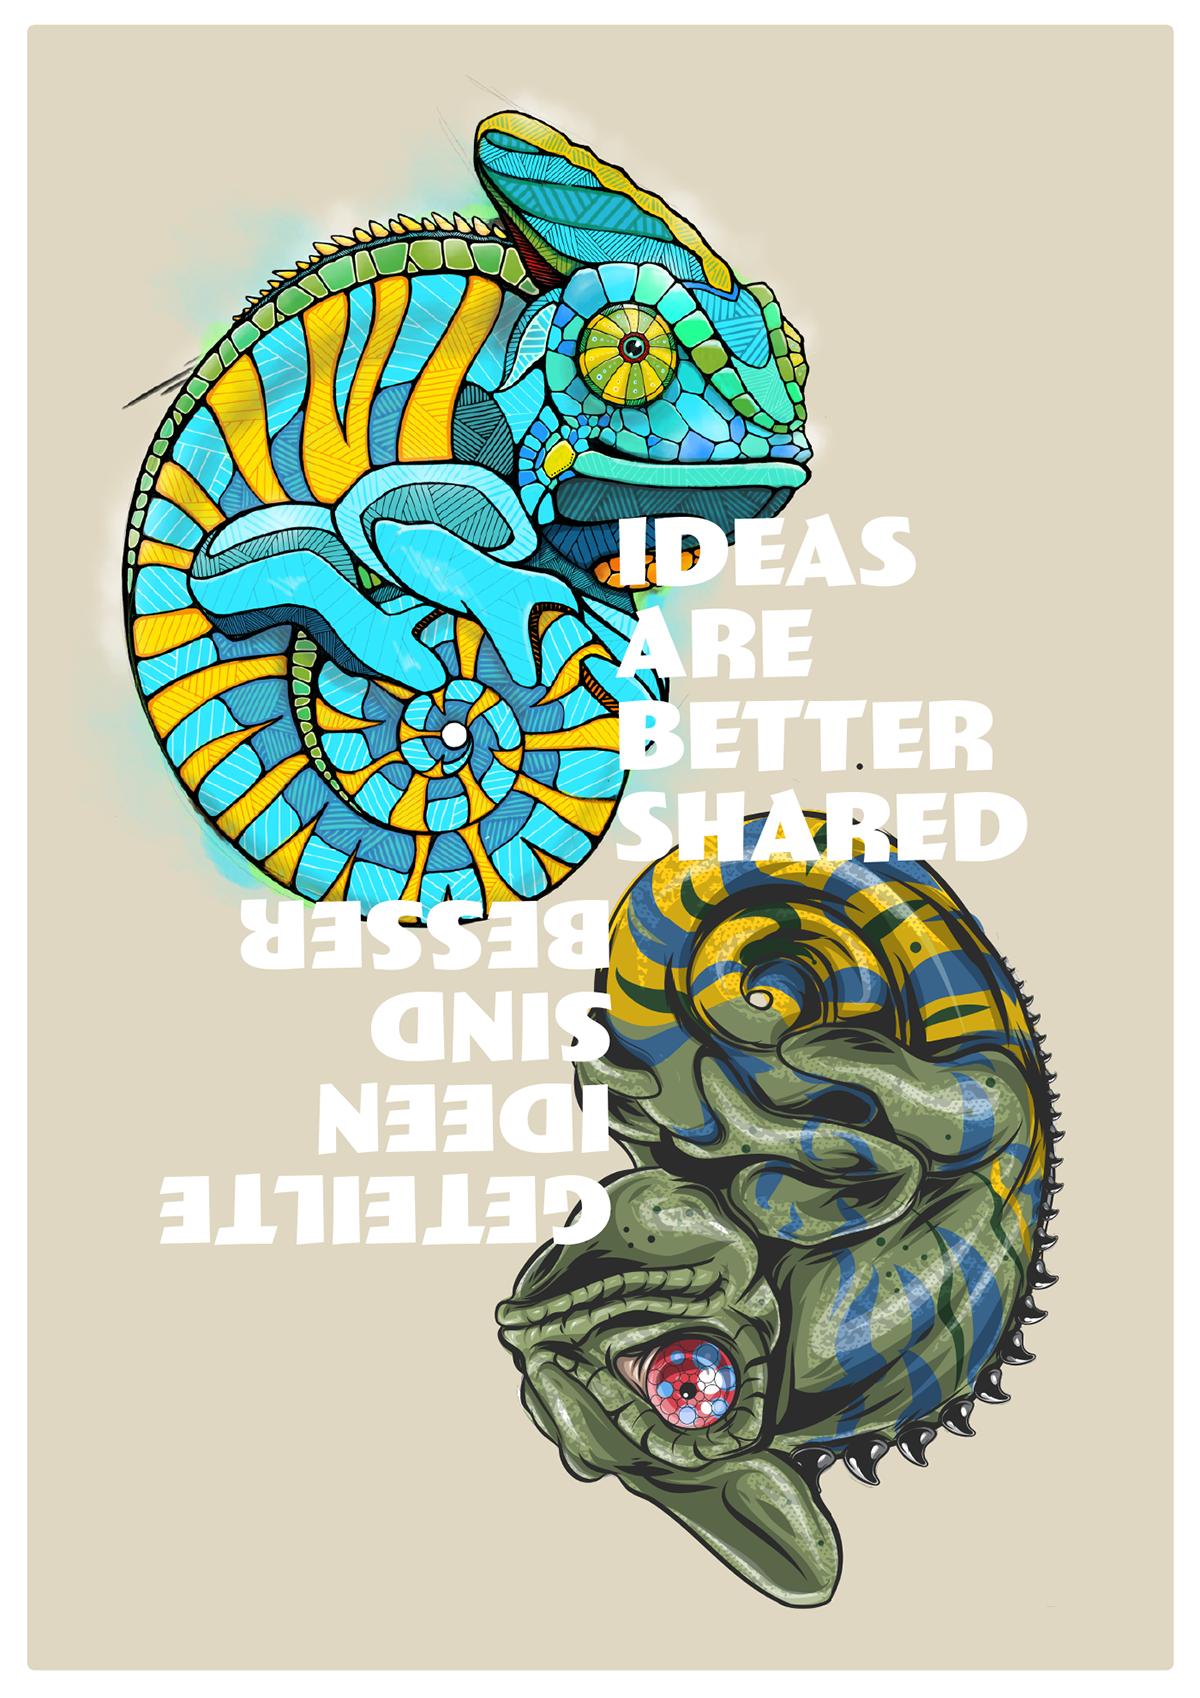 MakeItonMobile,adobe,ipad pro,apple pencil,illustrator draw,capture cc,comp cc,mobile art,photoshop sketch